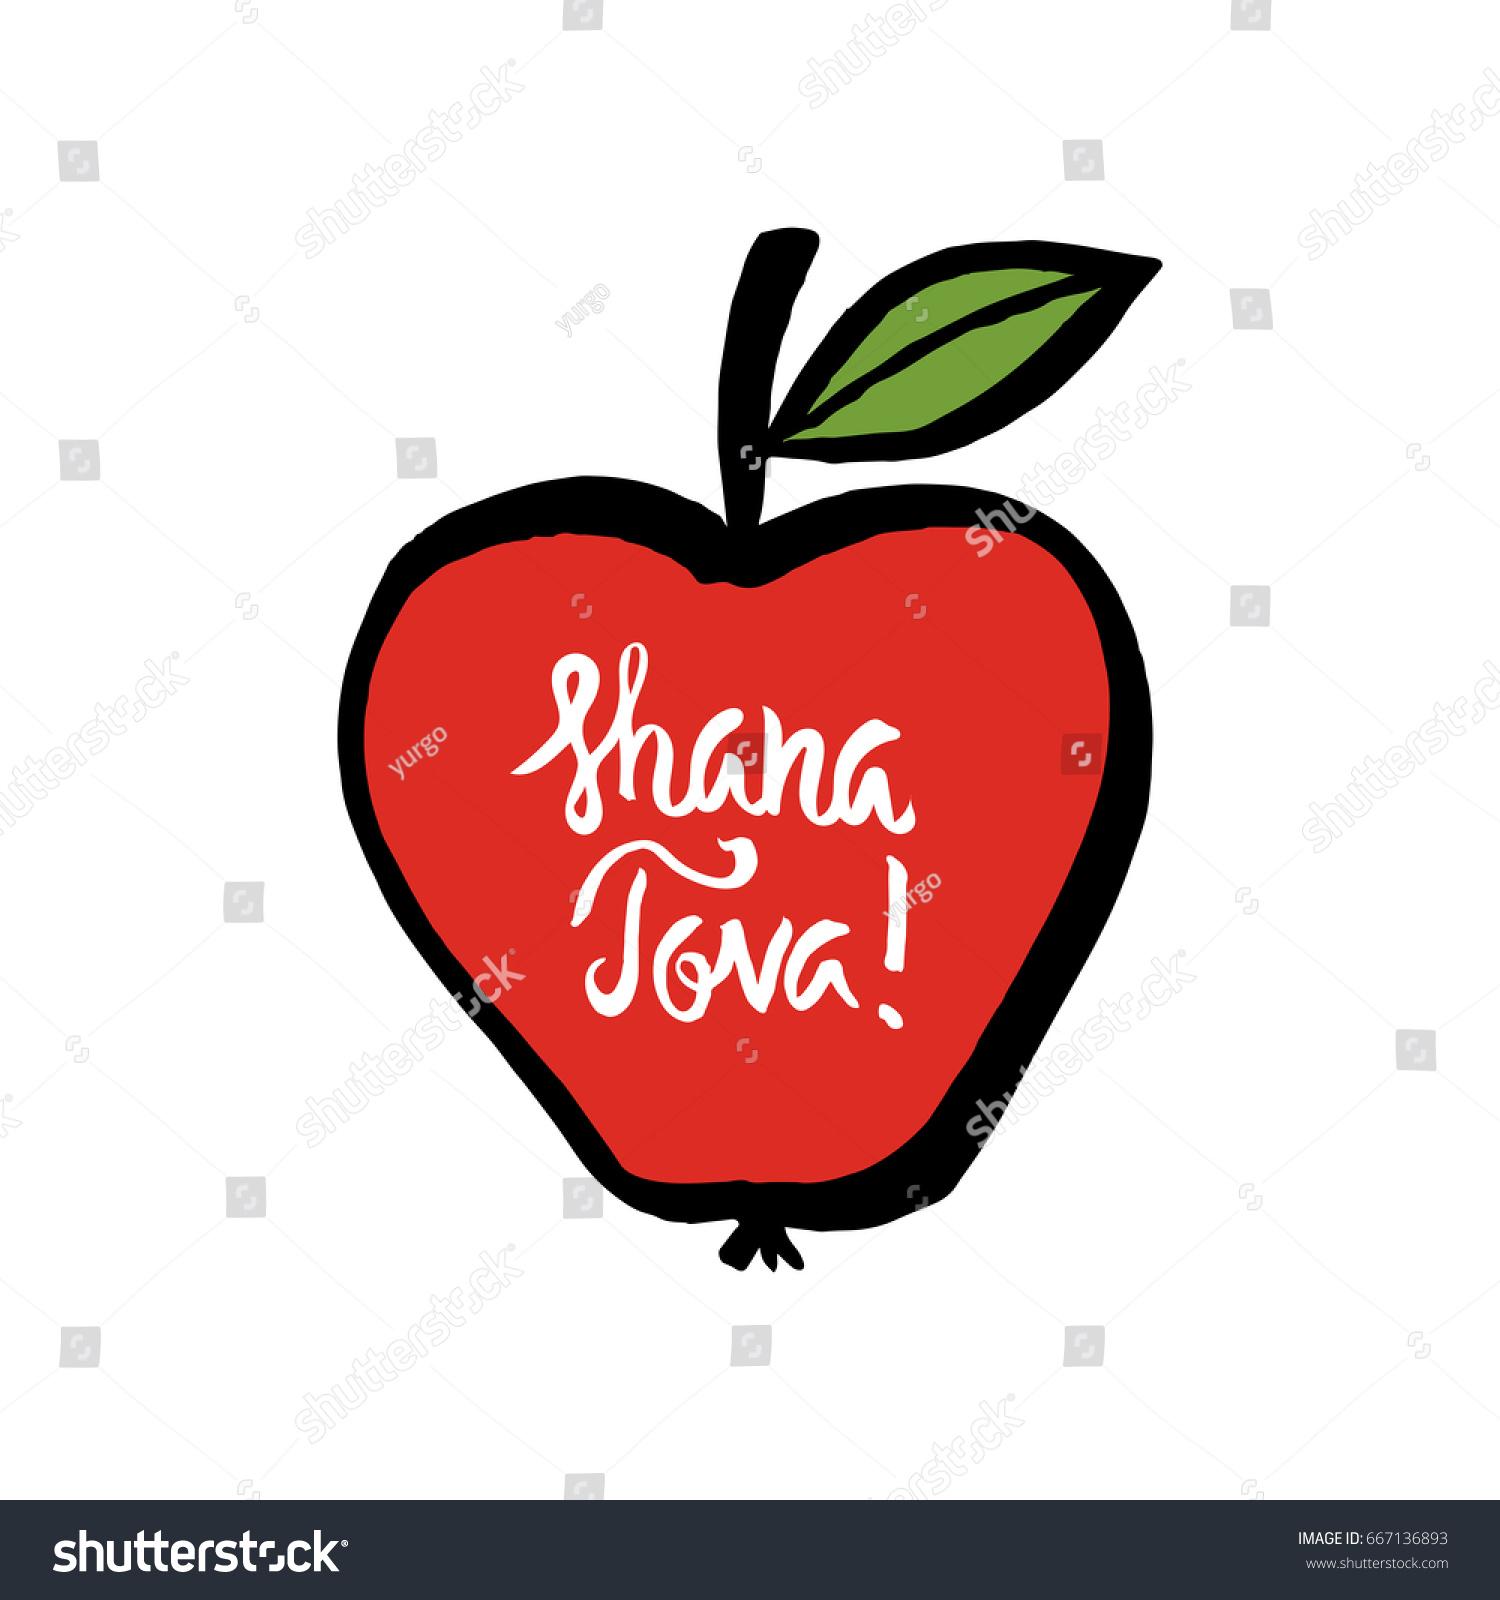 Shana tova rosh hashanah greeting card stock vector 667136893 shana tova rosh hashanah greeting card jewish new year hand drawn apple kristyandbryce Images